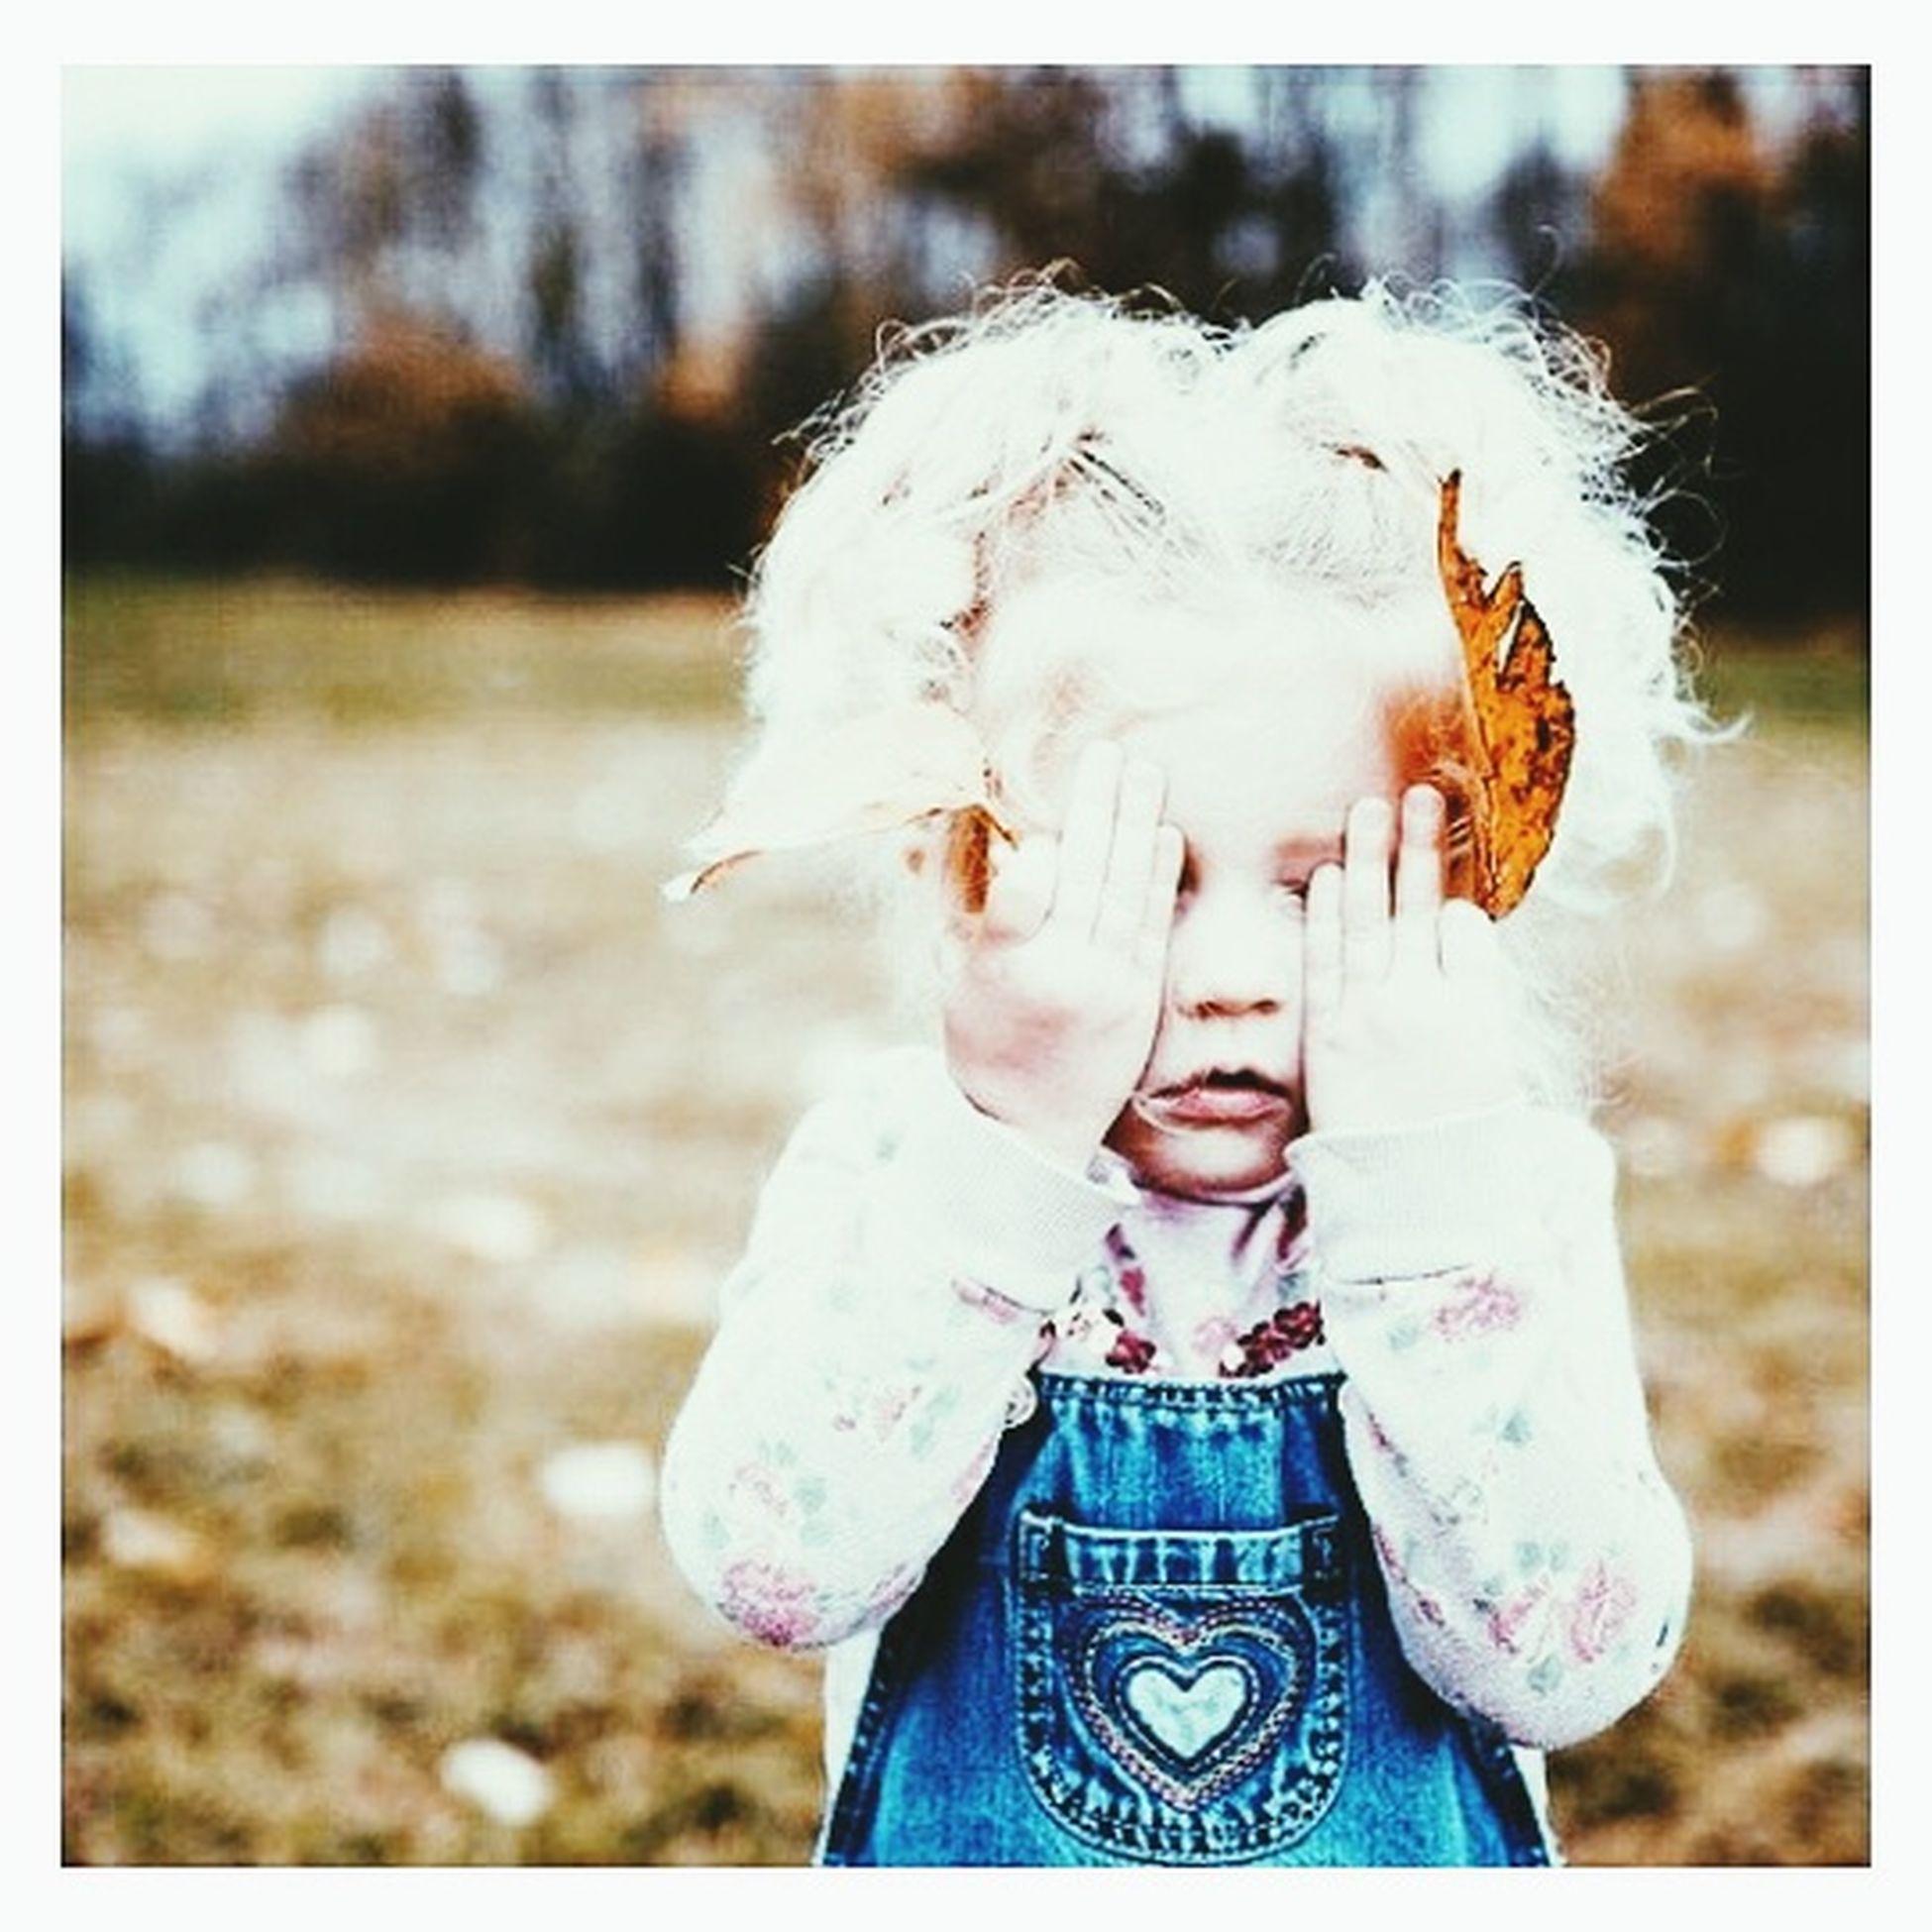 Sad Girl Bad Day Im Not Happy